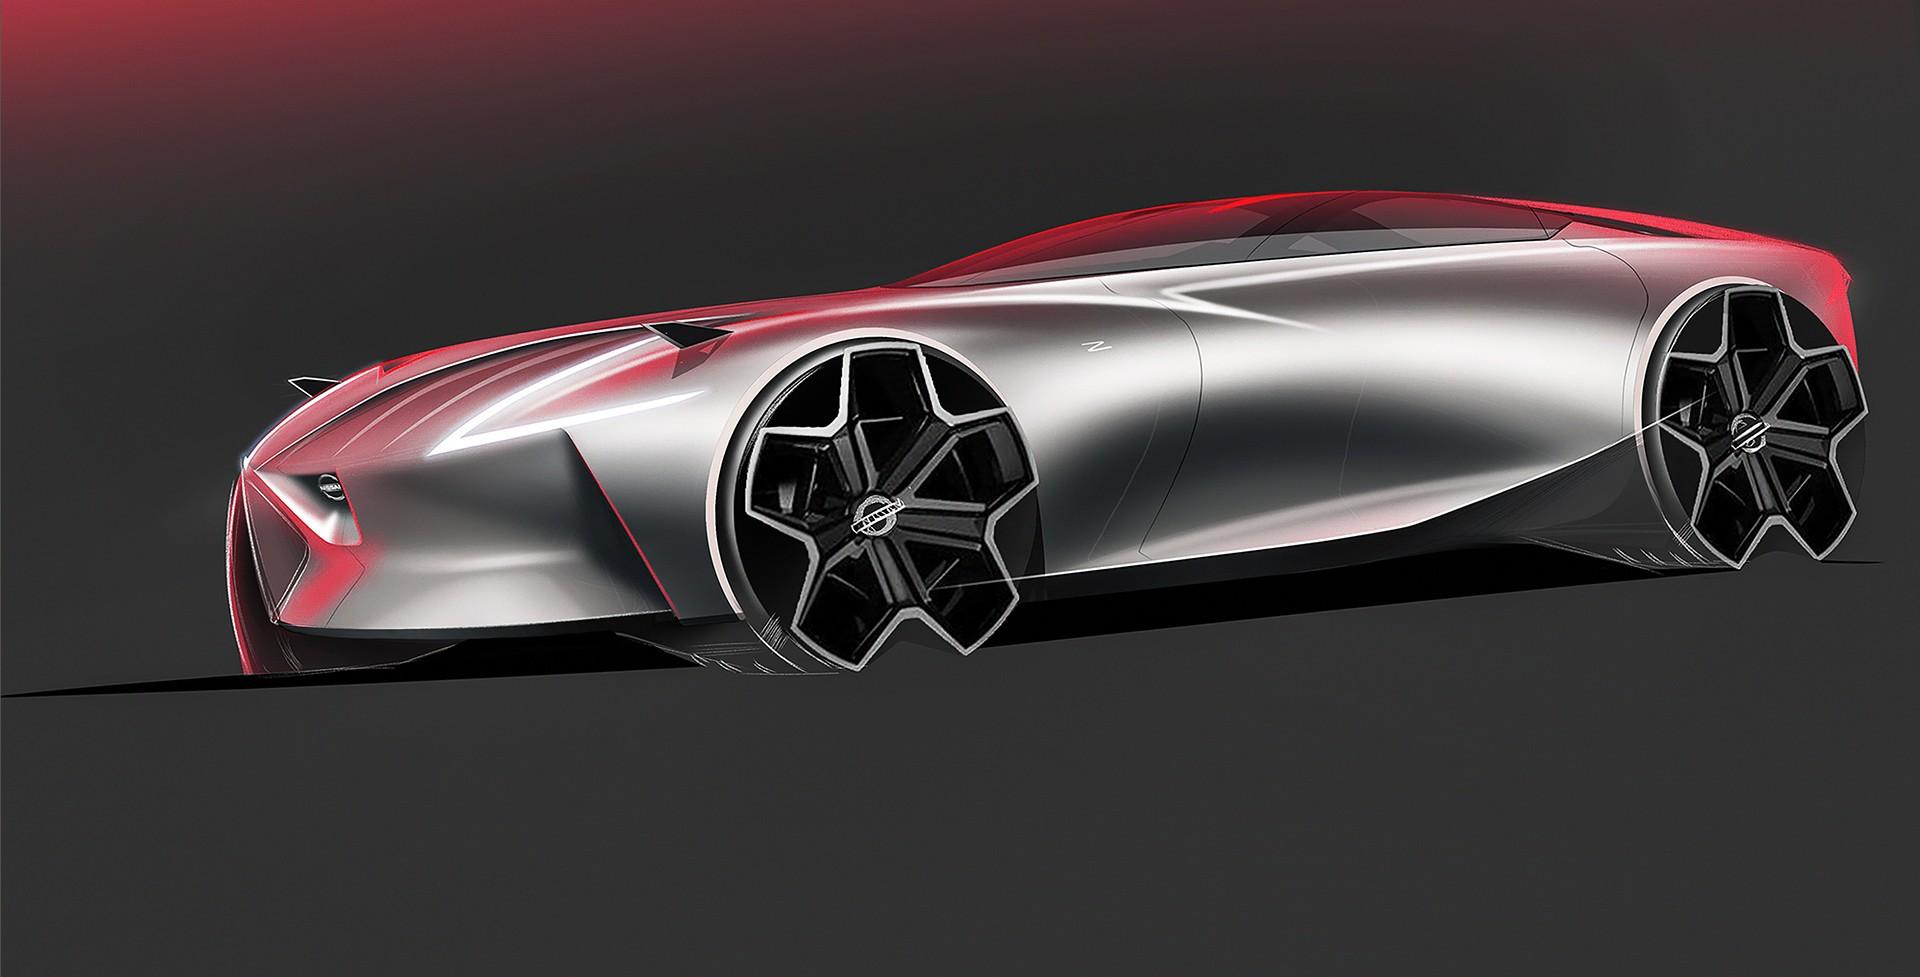 futuristic datsun 240z rendering called zvision looks